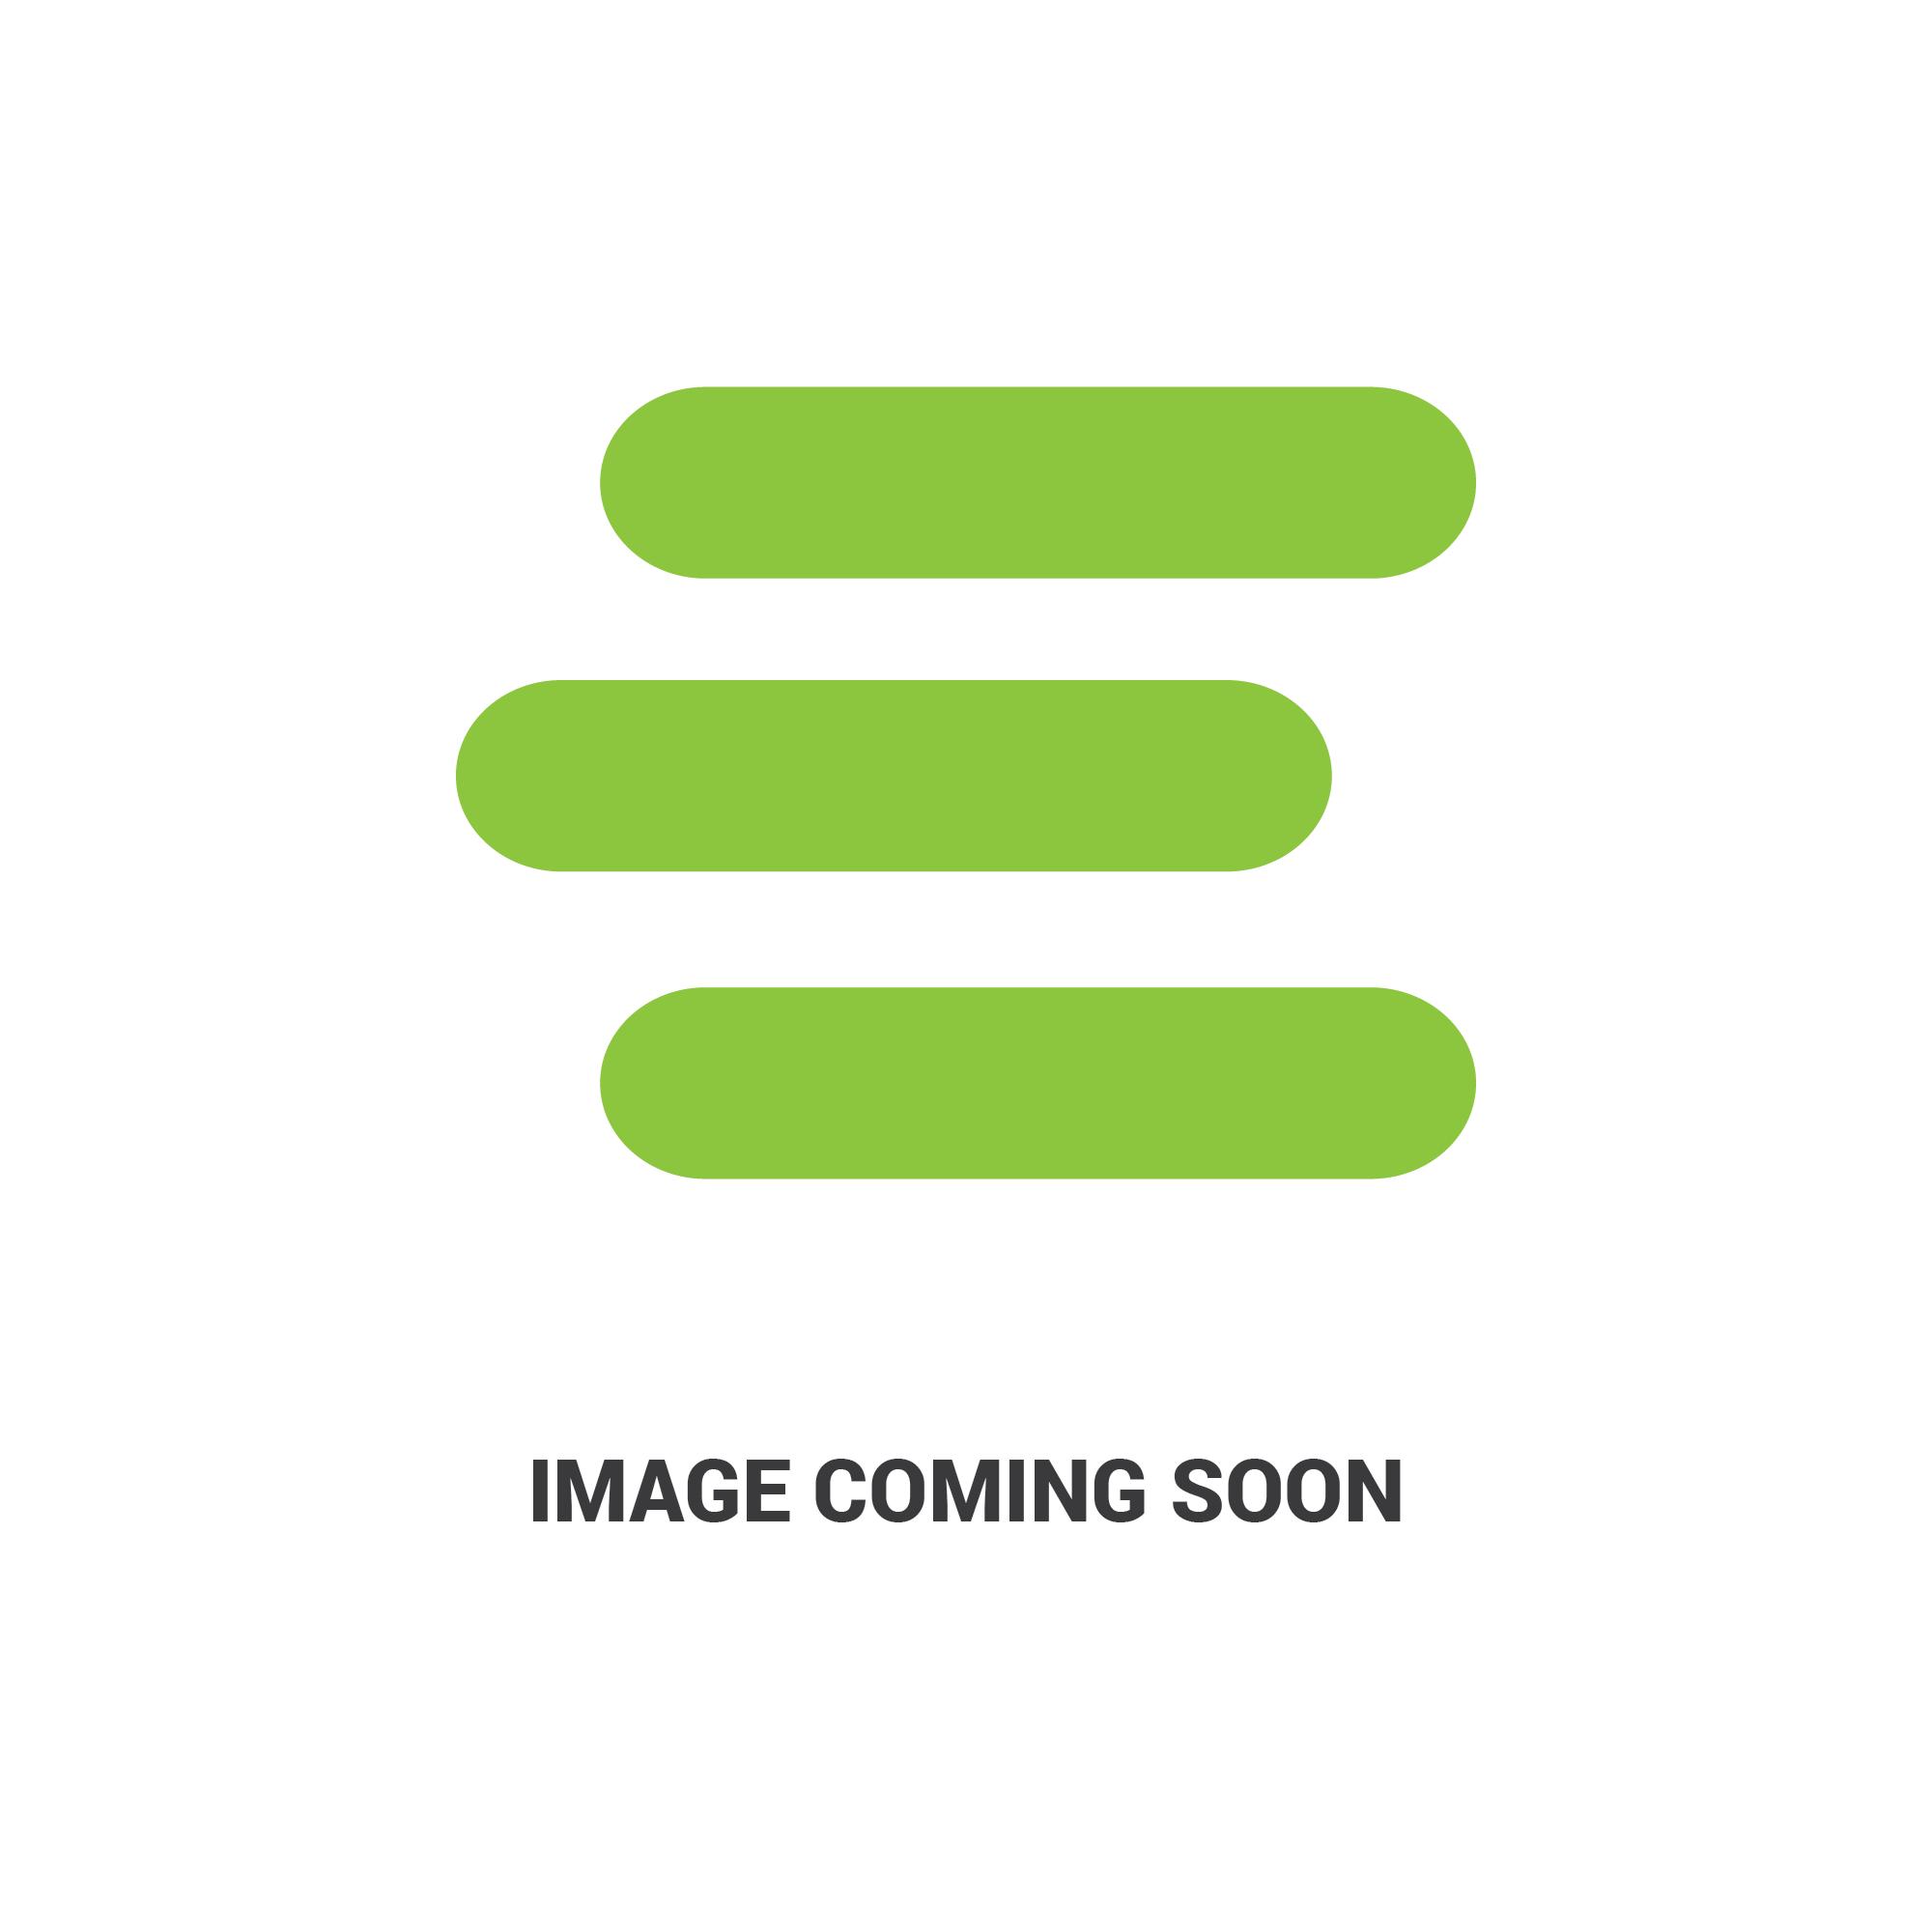 E-PM01542edit 1.jpg